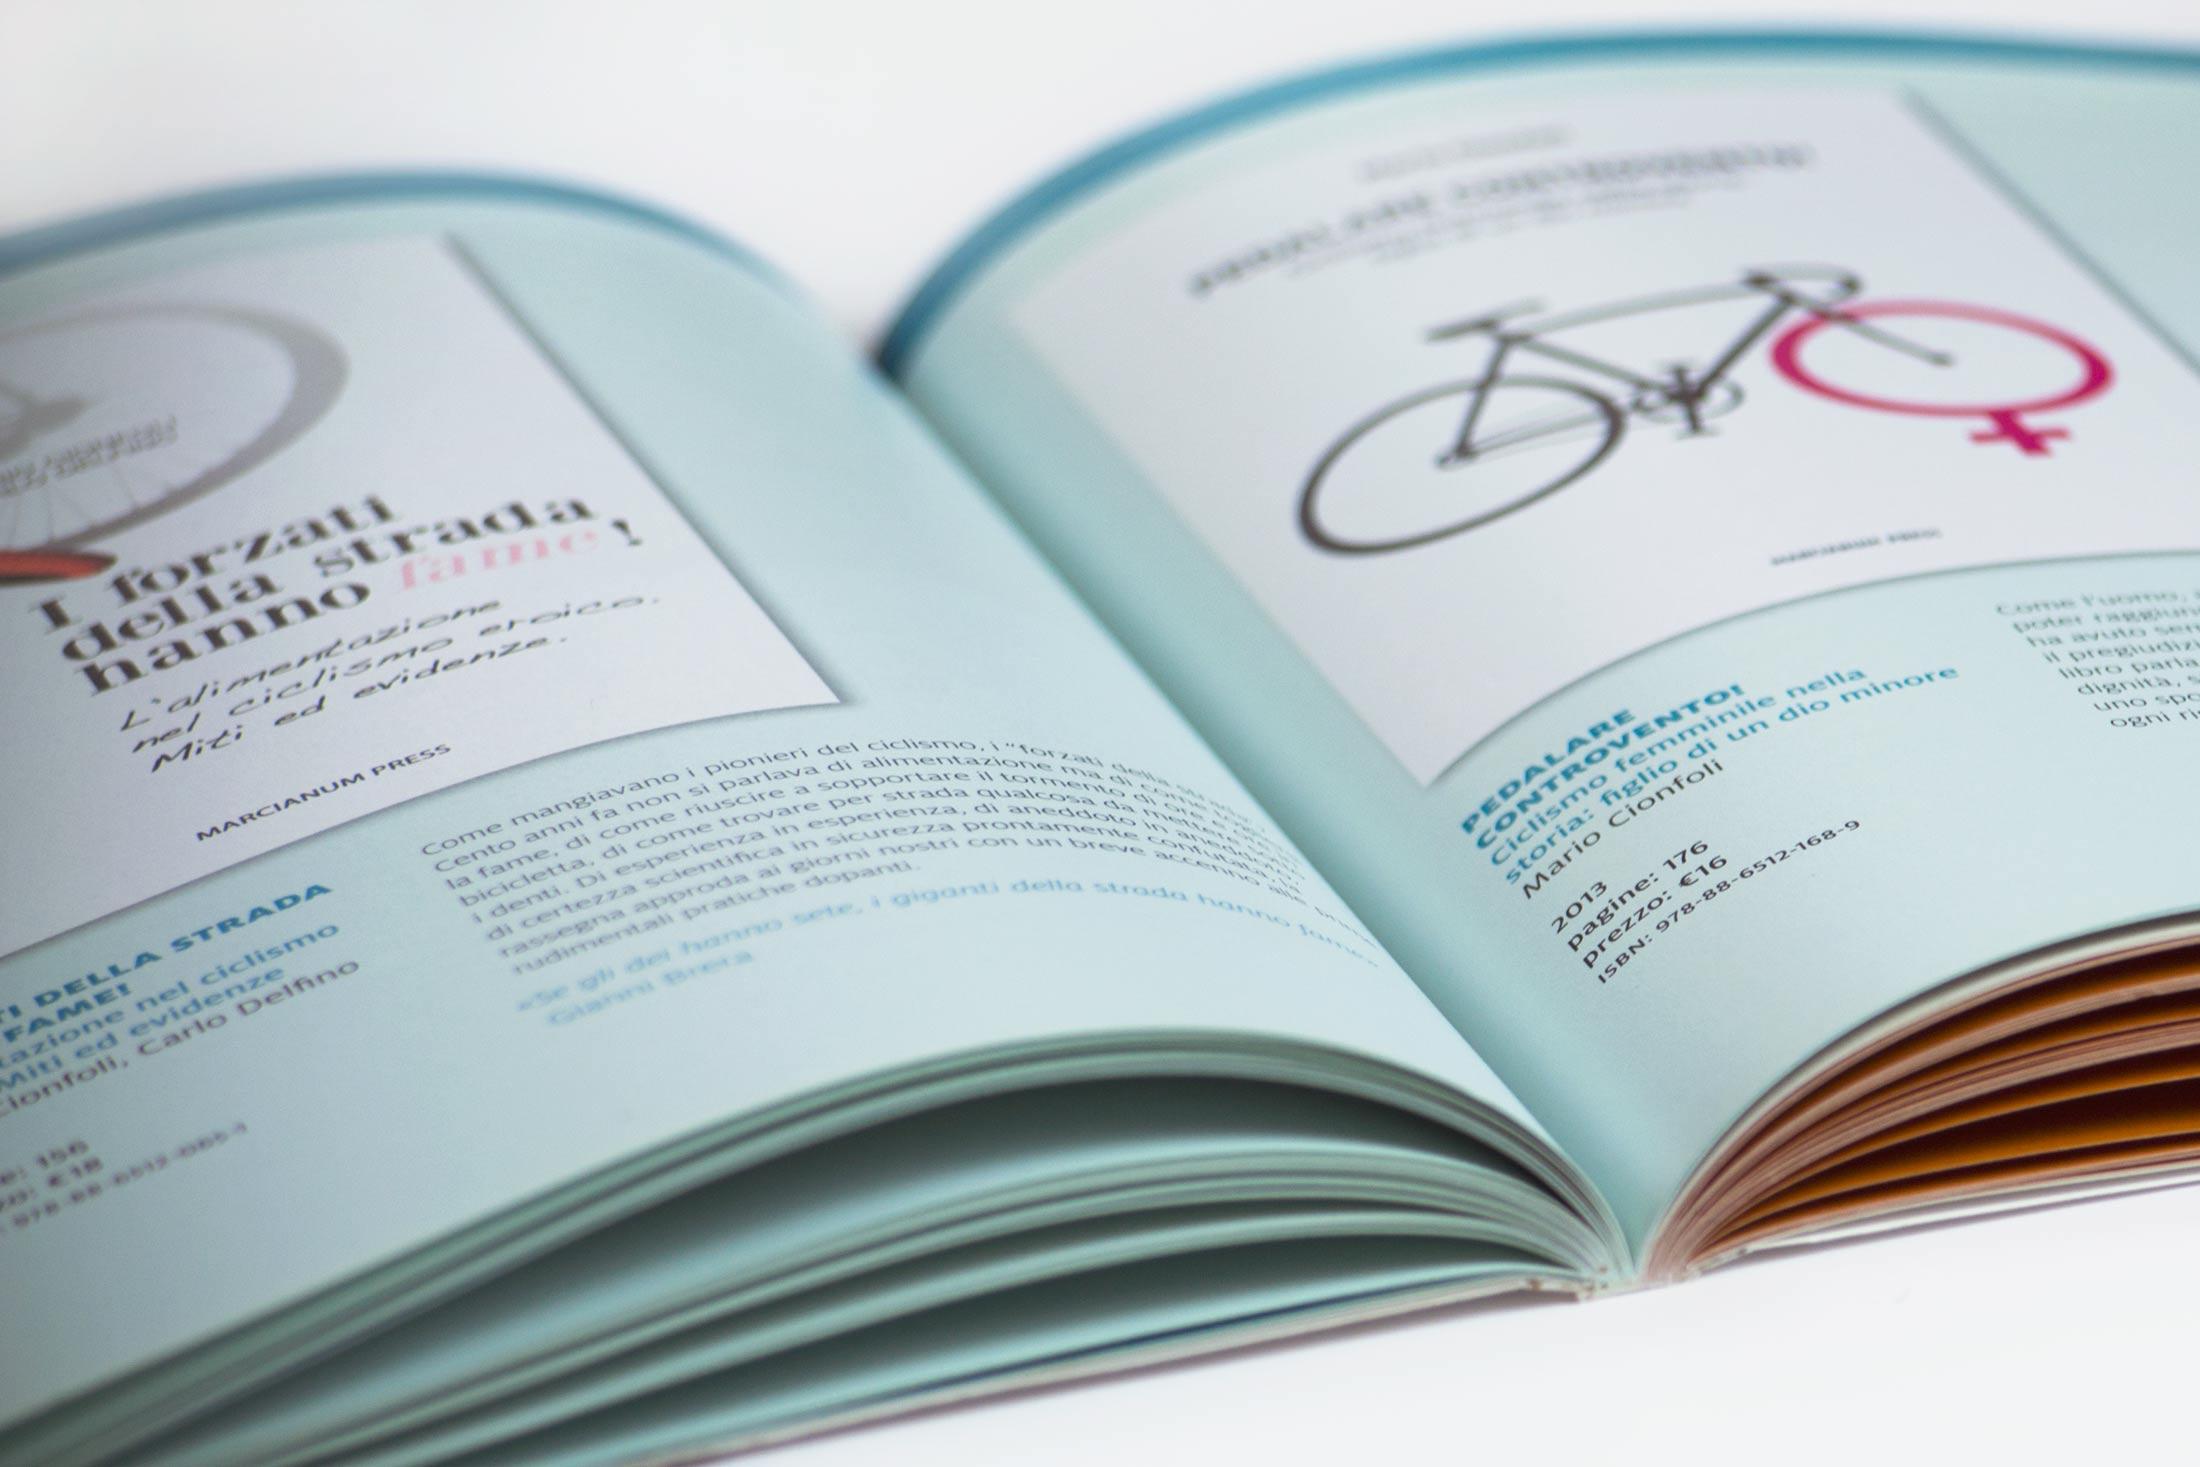 Catalogo Marcianum Press - particolare 4